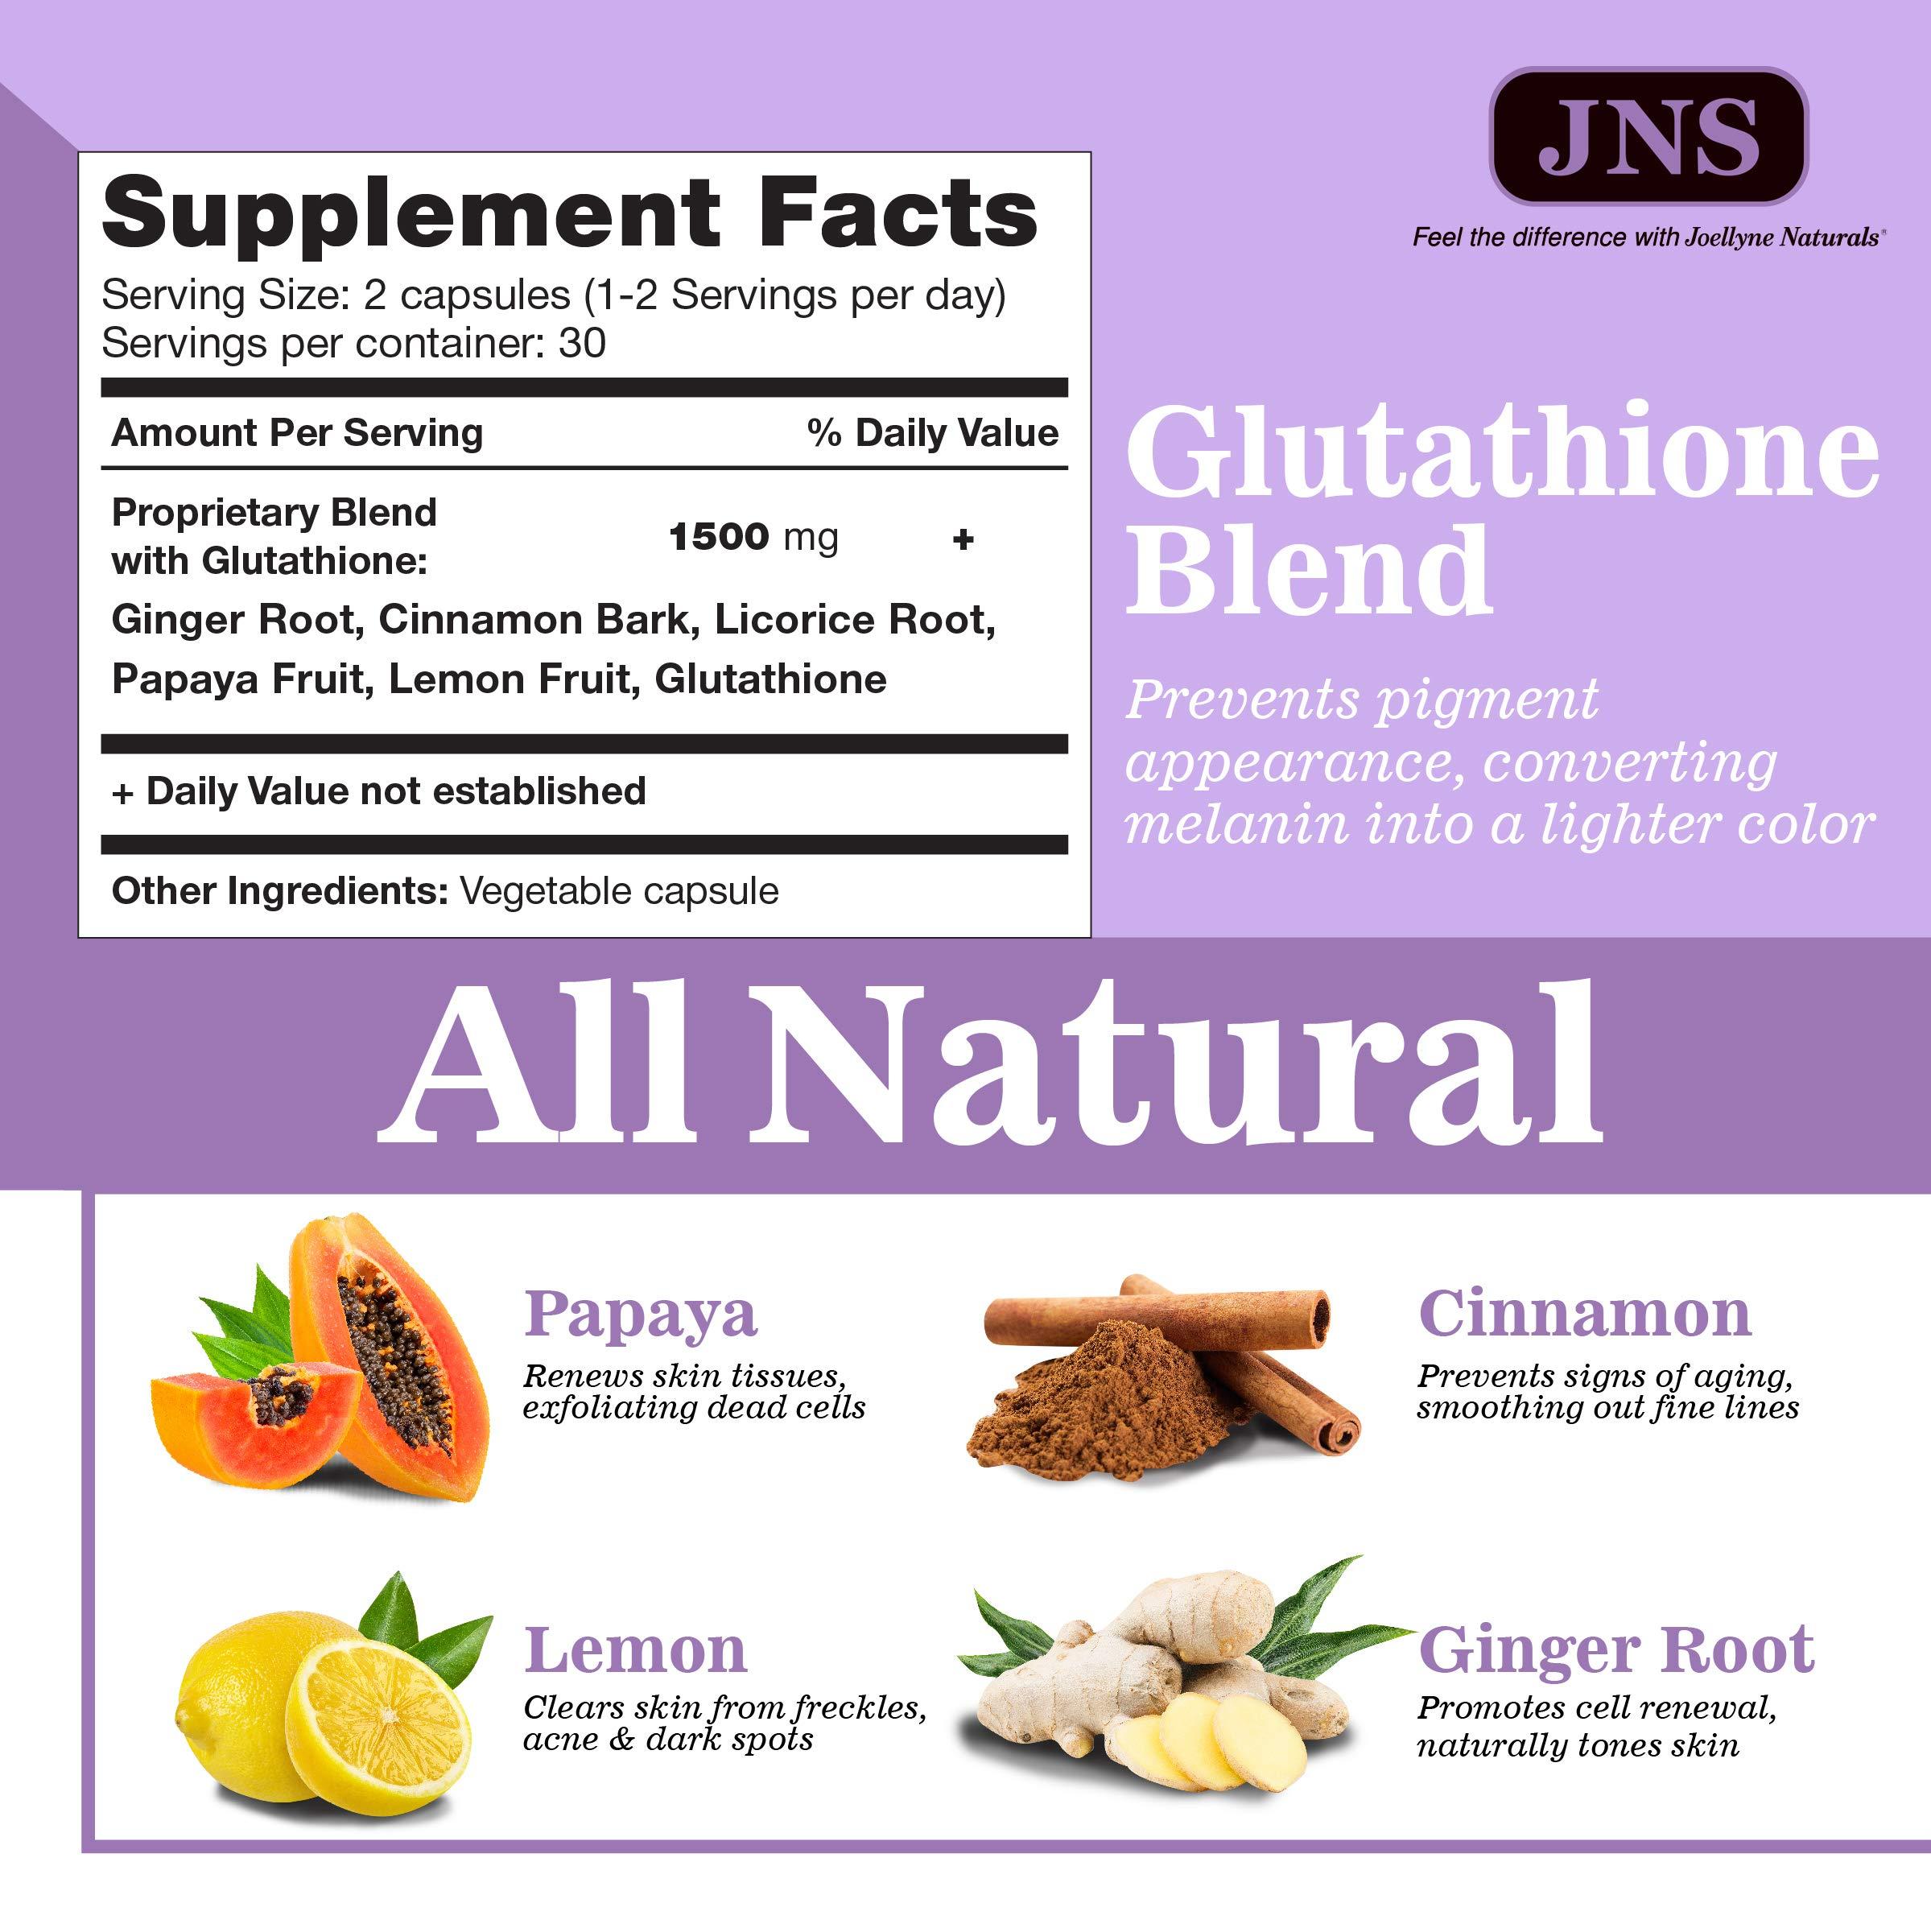 Glutathione Lightening Pills - 3000mg Glutathione Lightening Pills - Acne Scar & Dark Spot Remover - Natural Skin Lightener - Anti-Aging & Antioxidant Formula - 60 Capsules